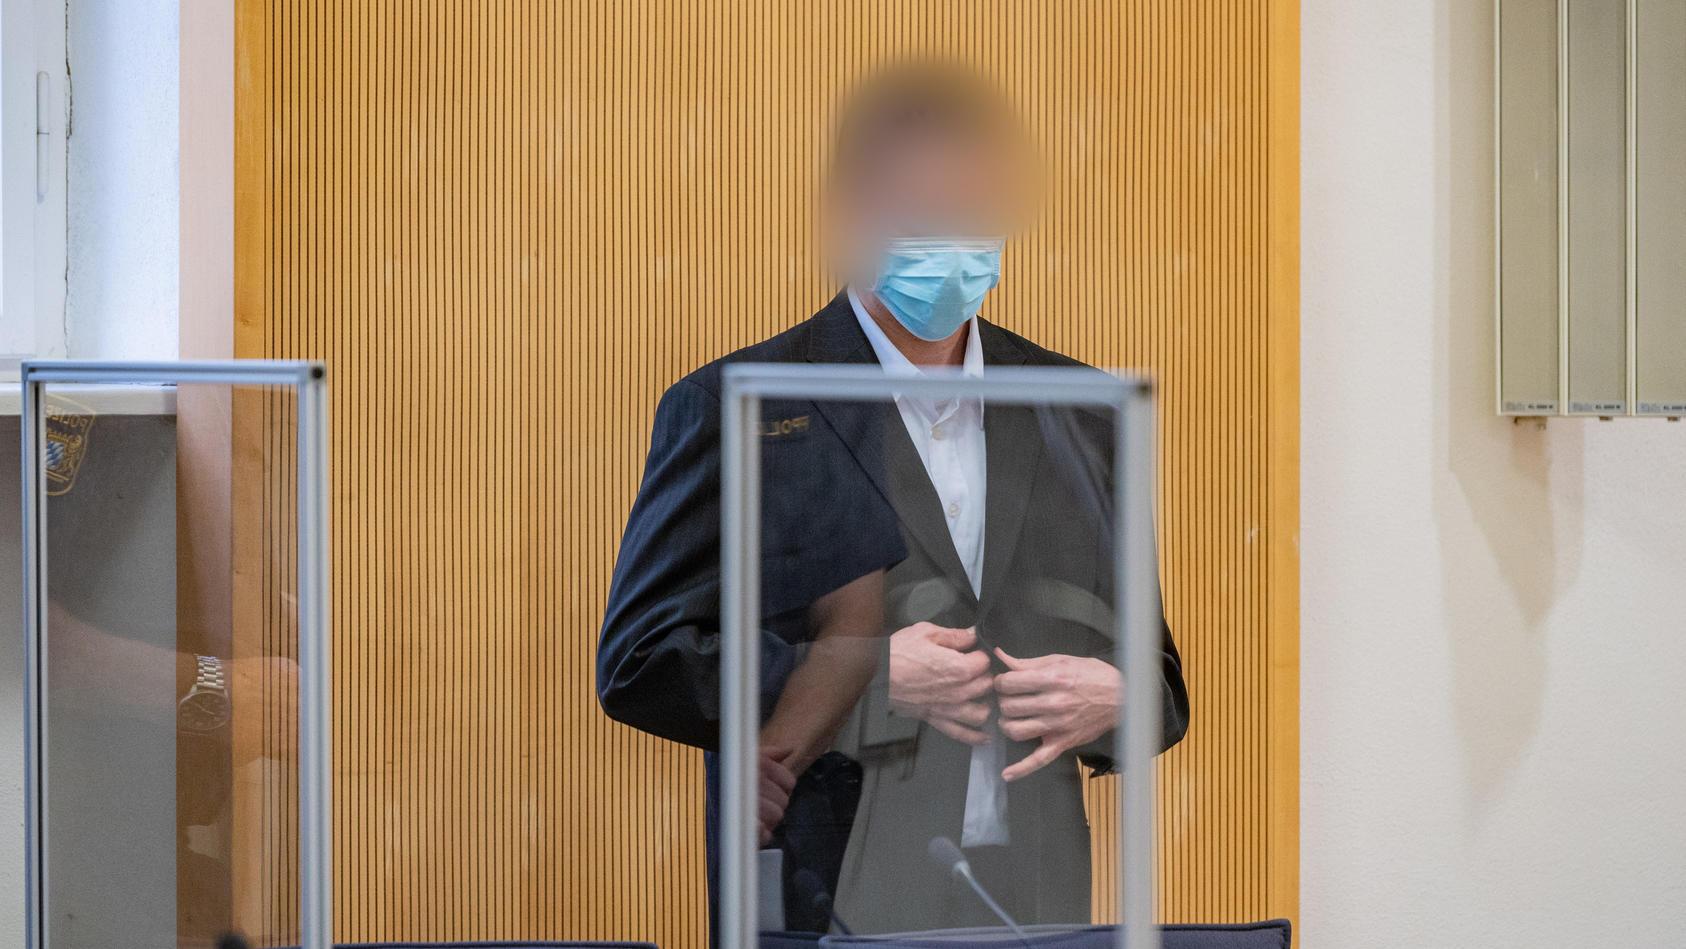 Urteil im Mordprozess im Fall Maria Baumer: Angeklagter Christian F. muss lebenslang ins Gefängnis